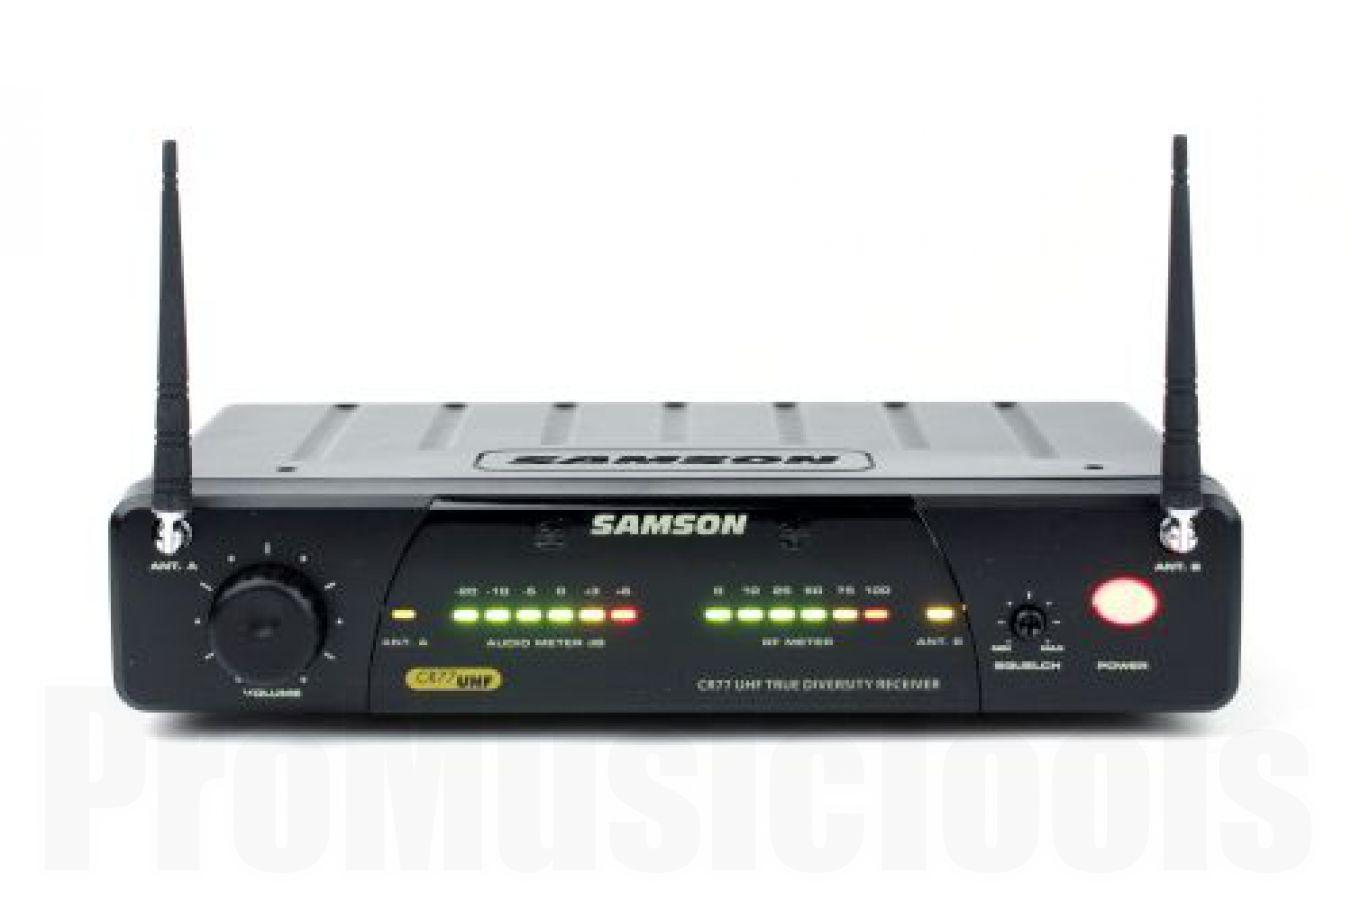 Samson Concert 77 C05 Wireless Handheld Condenser Mic System (E3)